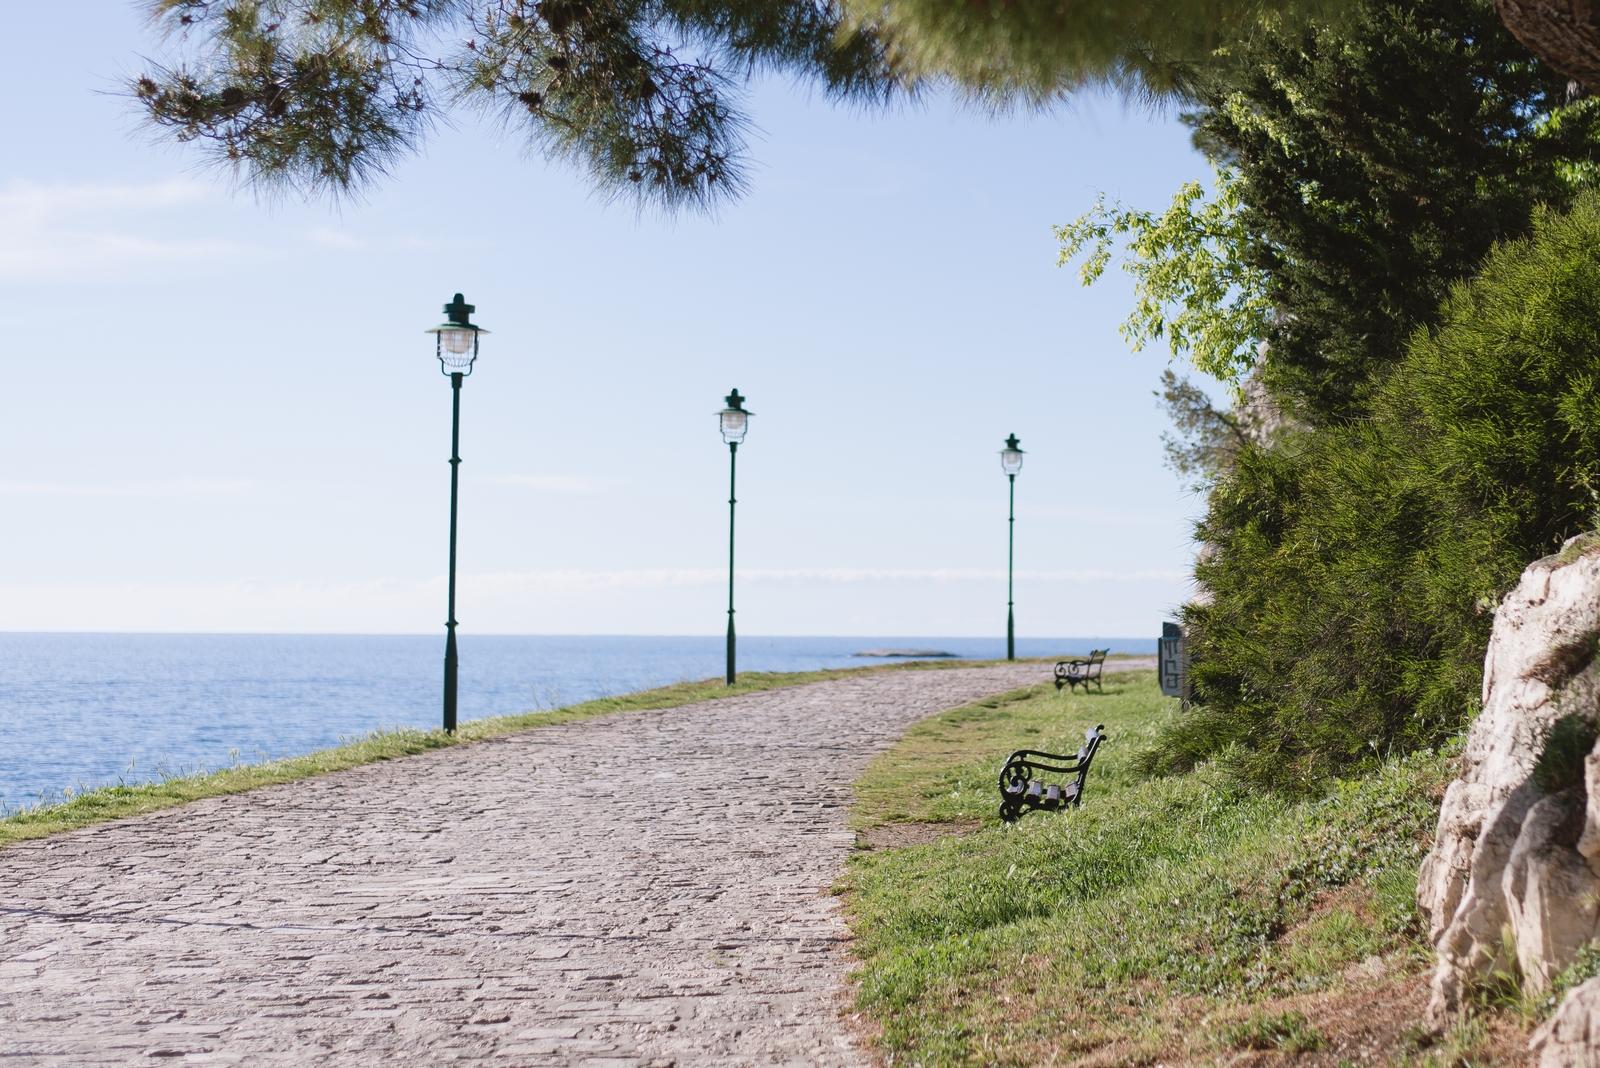 Šetalište braće Gnot, a seaside promenade in the old town of Rovinj, Istria, Croatia - from travel blog http://Epepa.eu